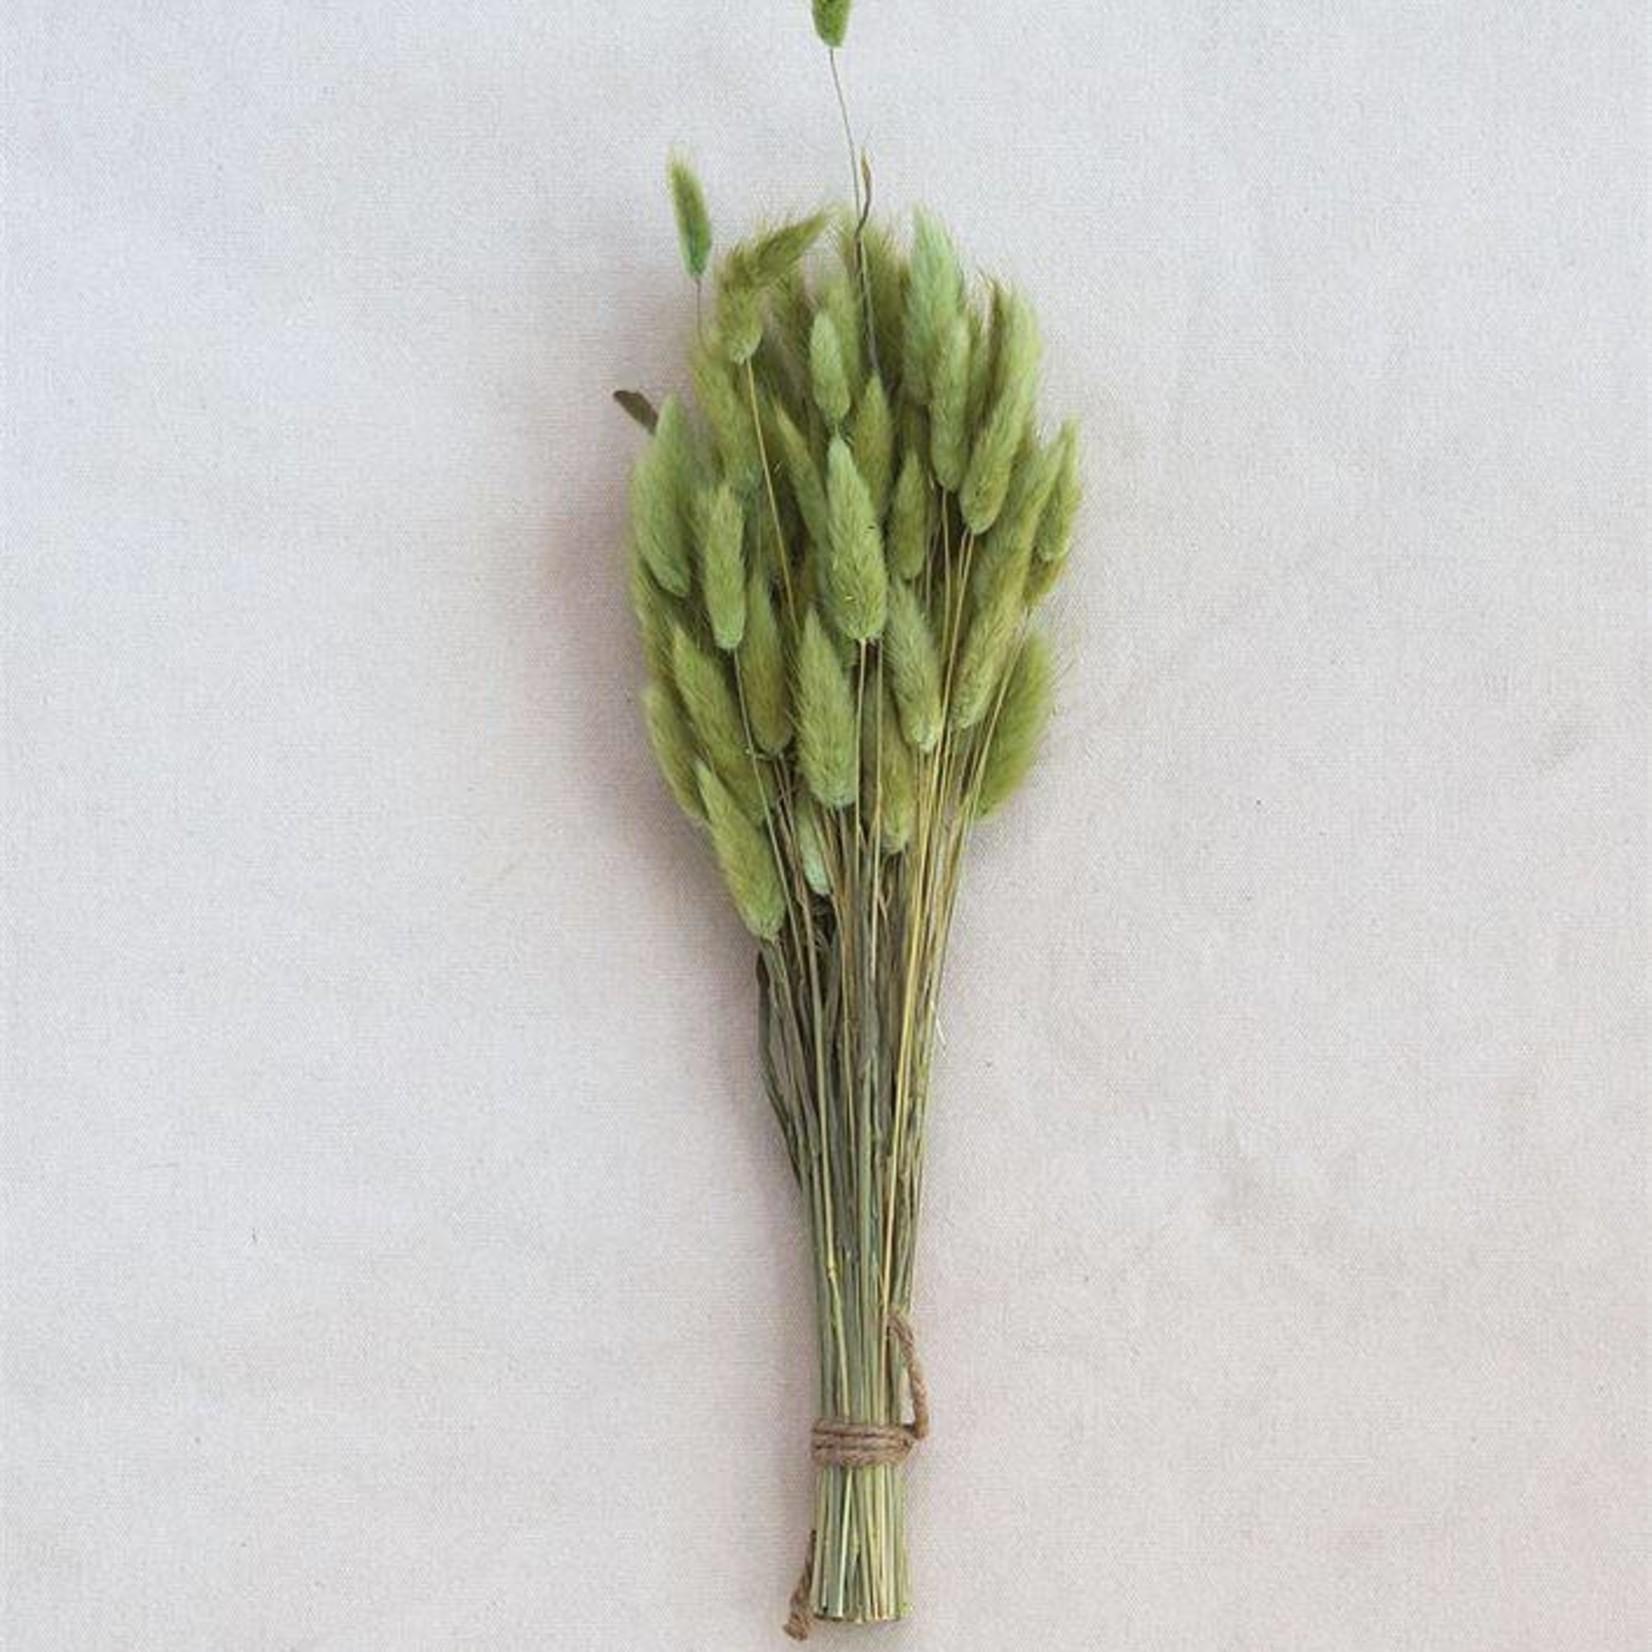 Bunny Tail Grass Bunch Green